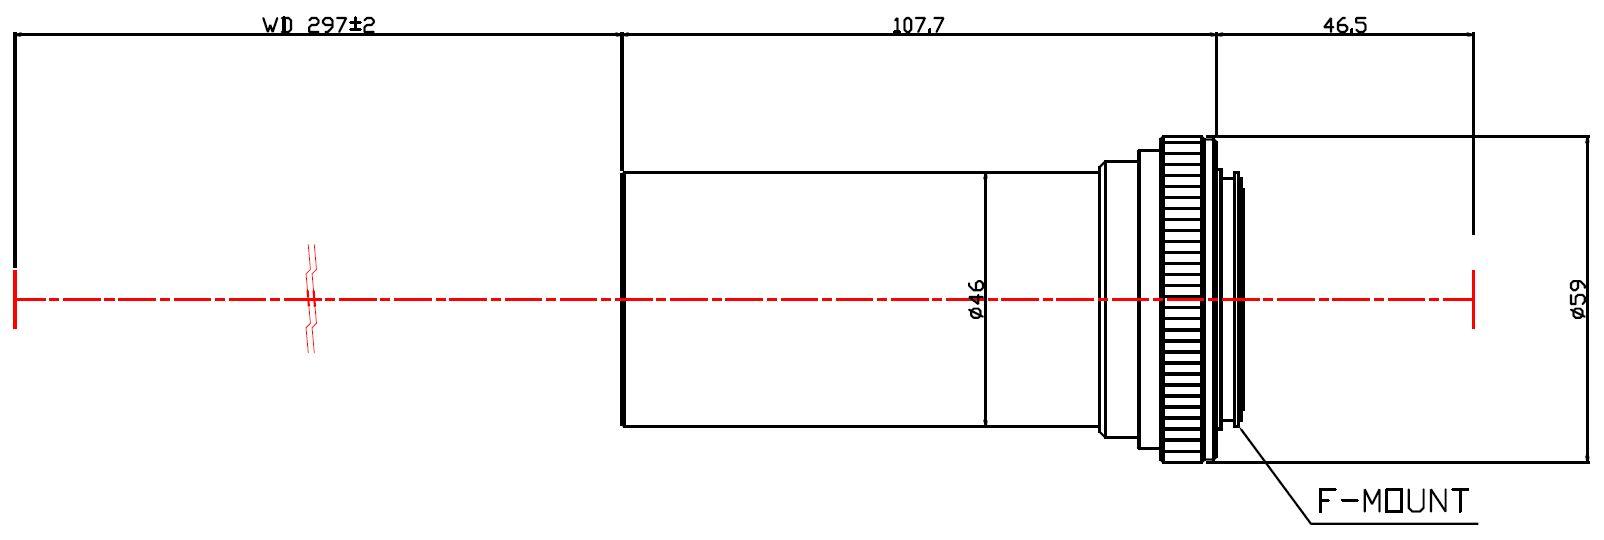 Lensagon MF8M-0296-267